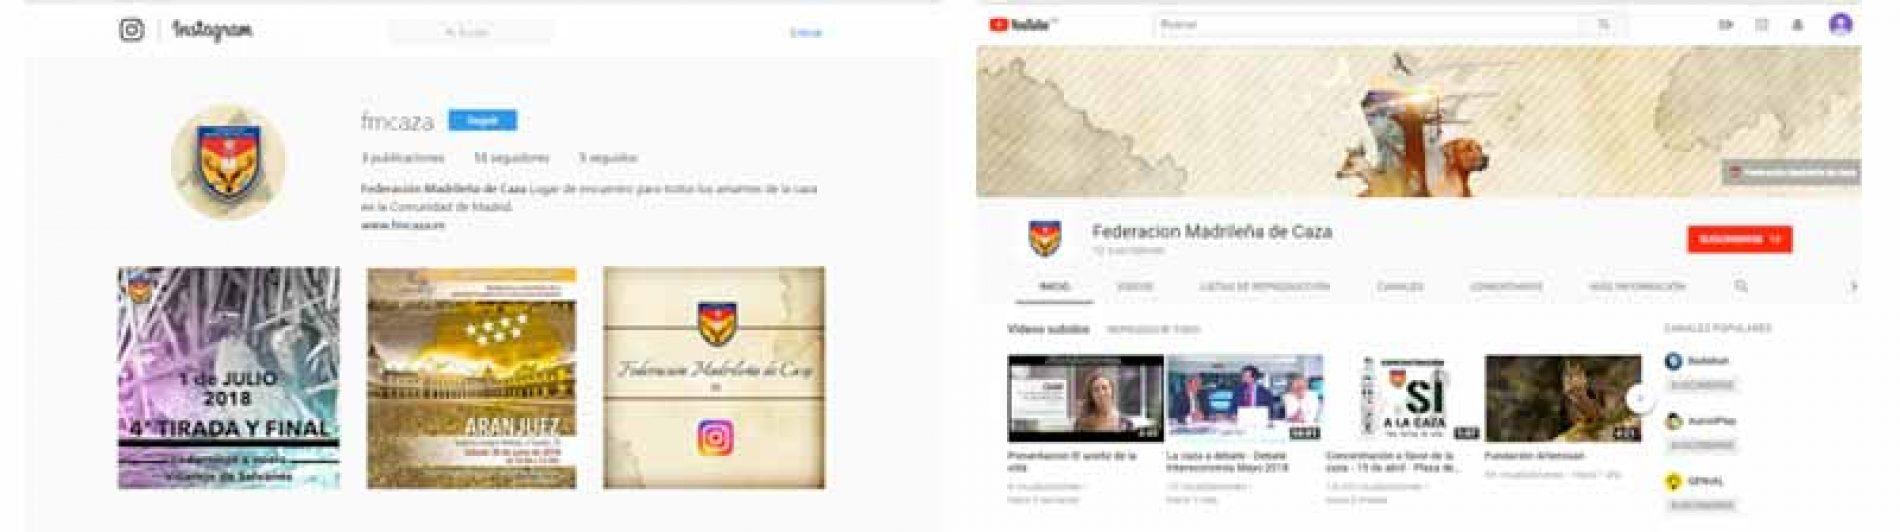 La Federación Madrileña de Caza presente en Youtube e Instagram